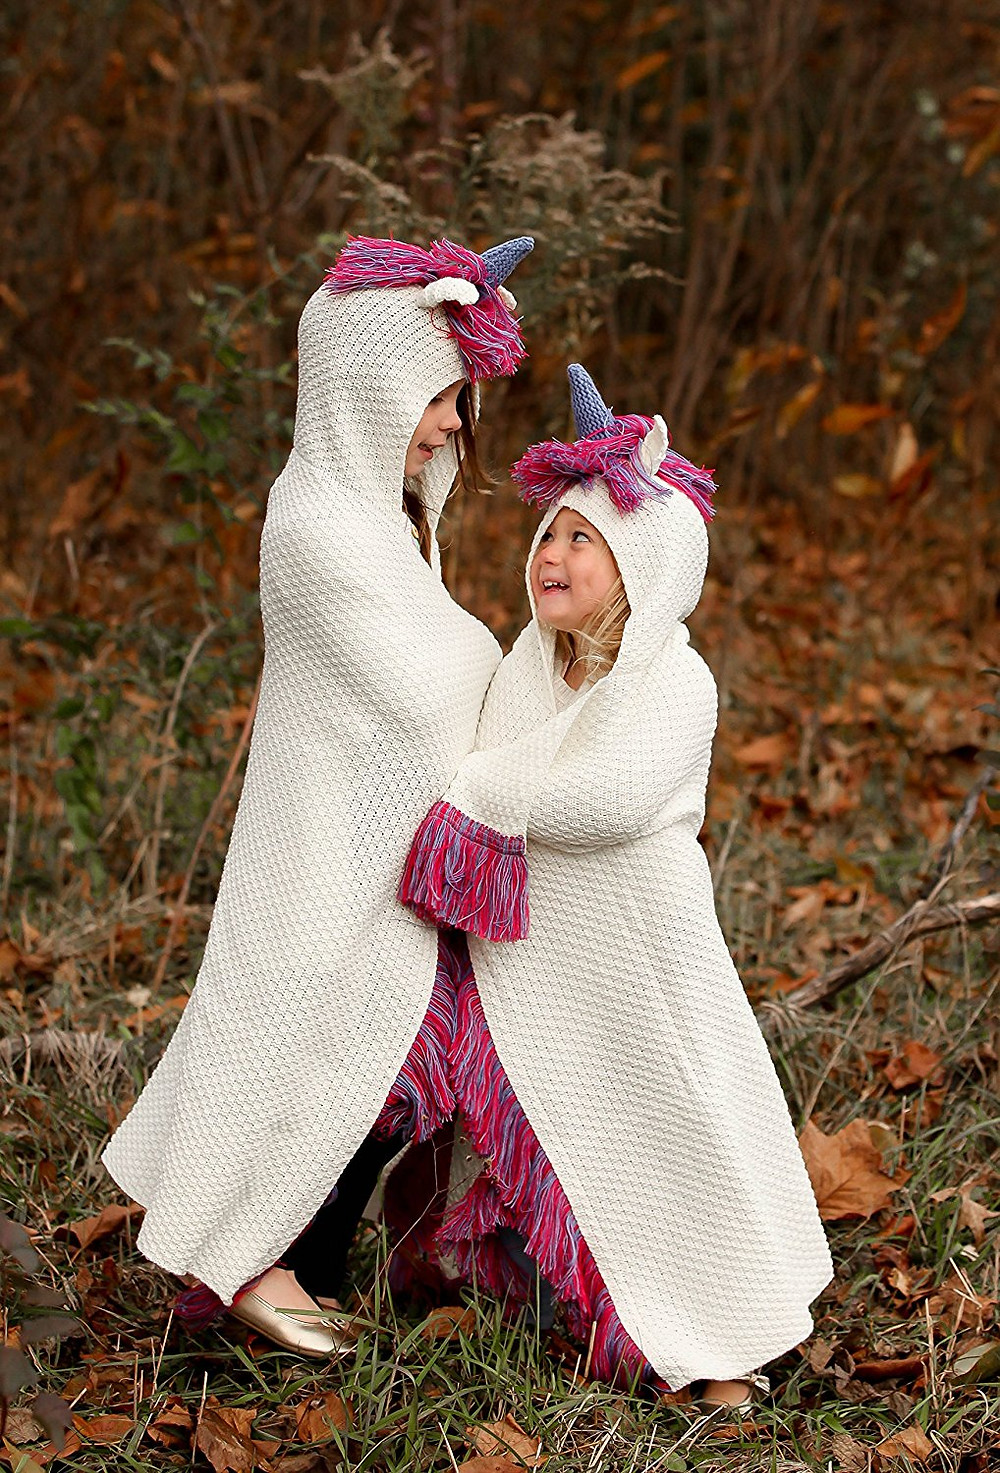 crochet unicorn, knitted unicorn, wearable blanket, snuggie, kids blanket, unicorn blanket, hooded blanket, unicorn cosplay, unicorn, unicorn lover, unicorn gift, unicorn gift guide